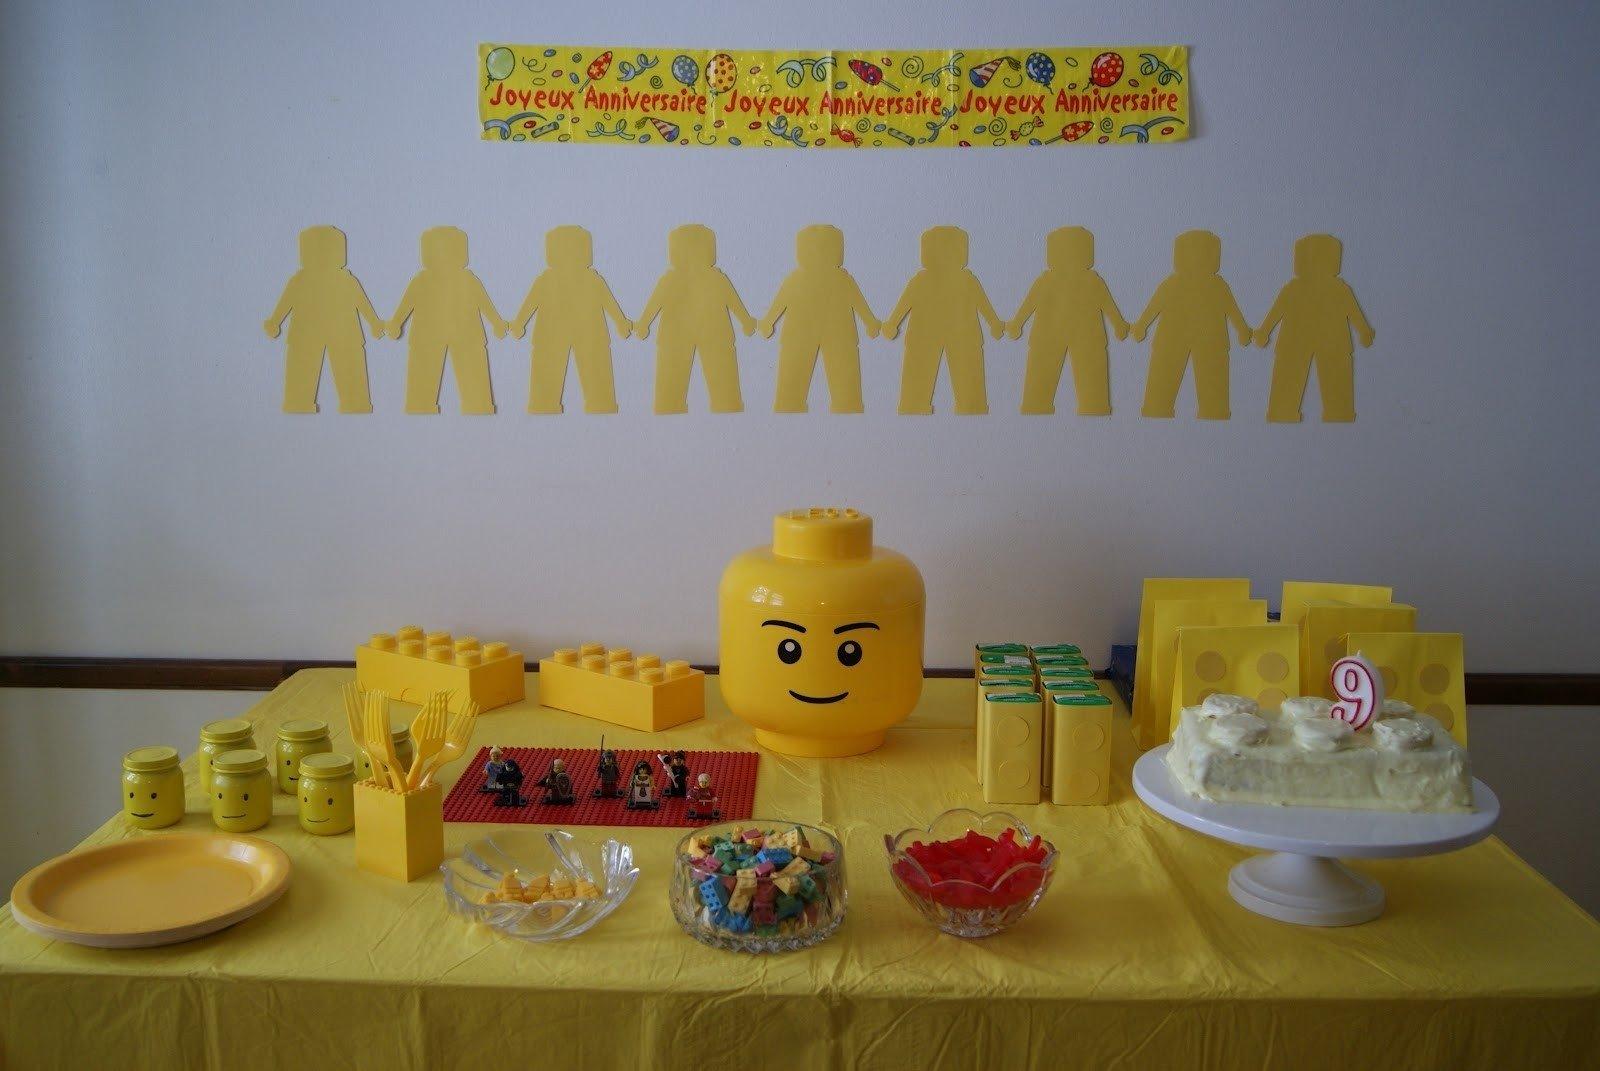 10 Stunning 6 Yr Old Birthday Party Ideas birthday party ideas for 10 year old boy best of birthday party boy